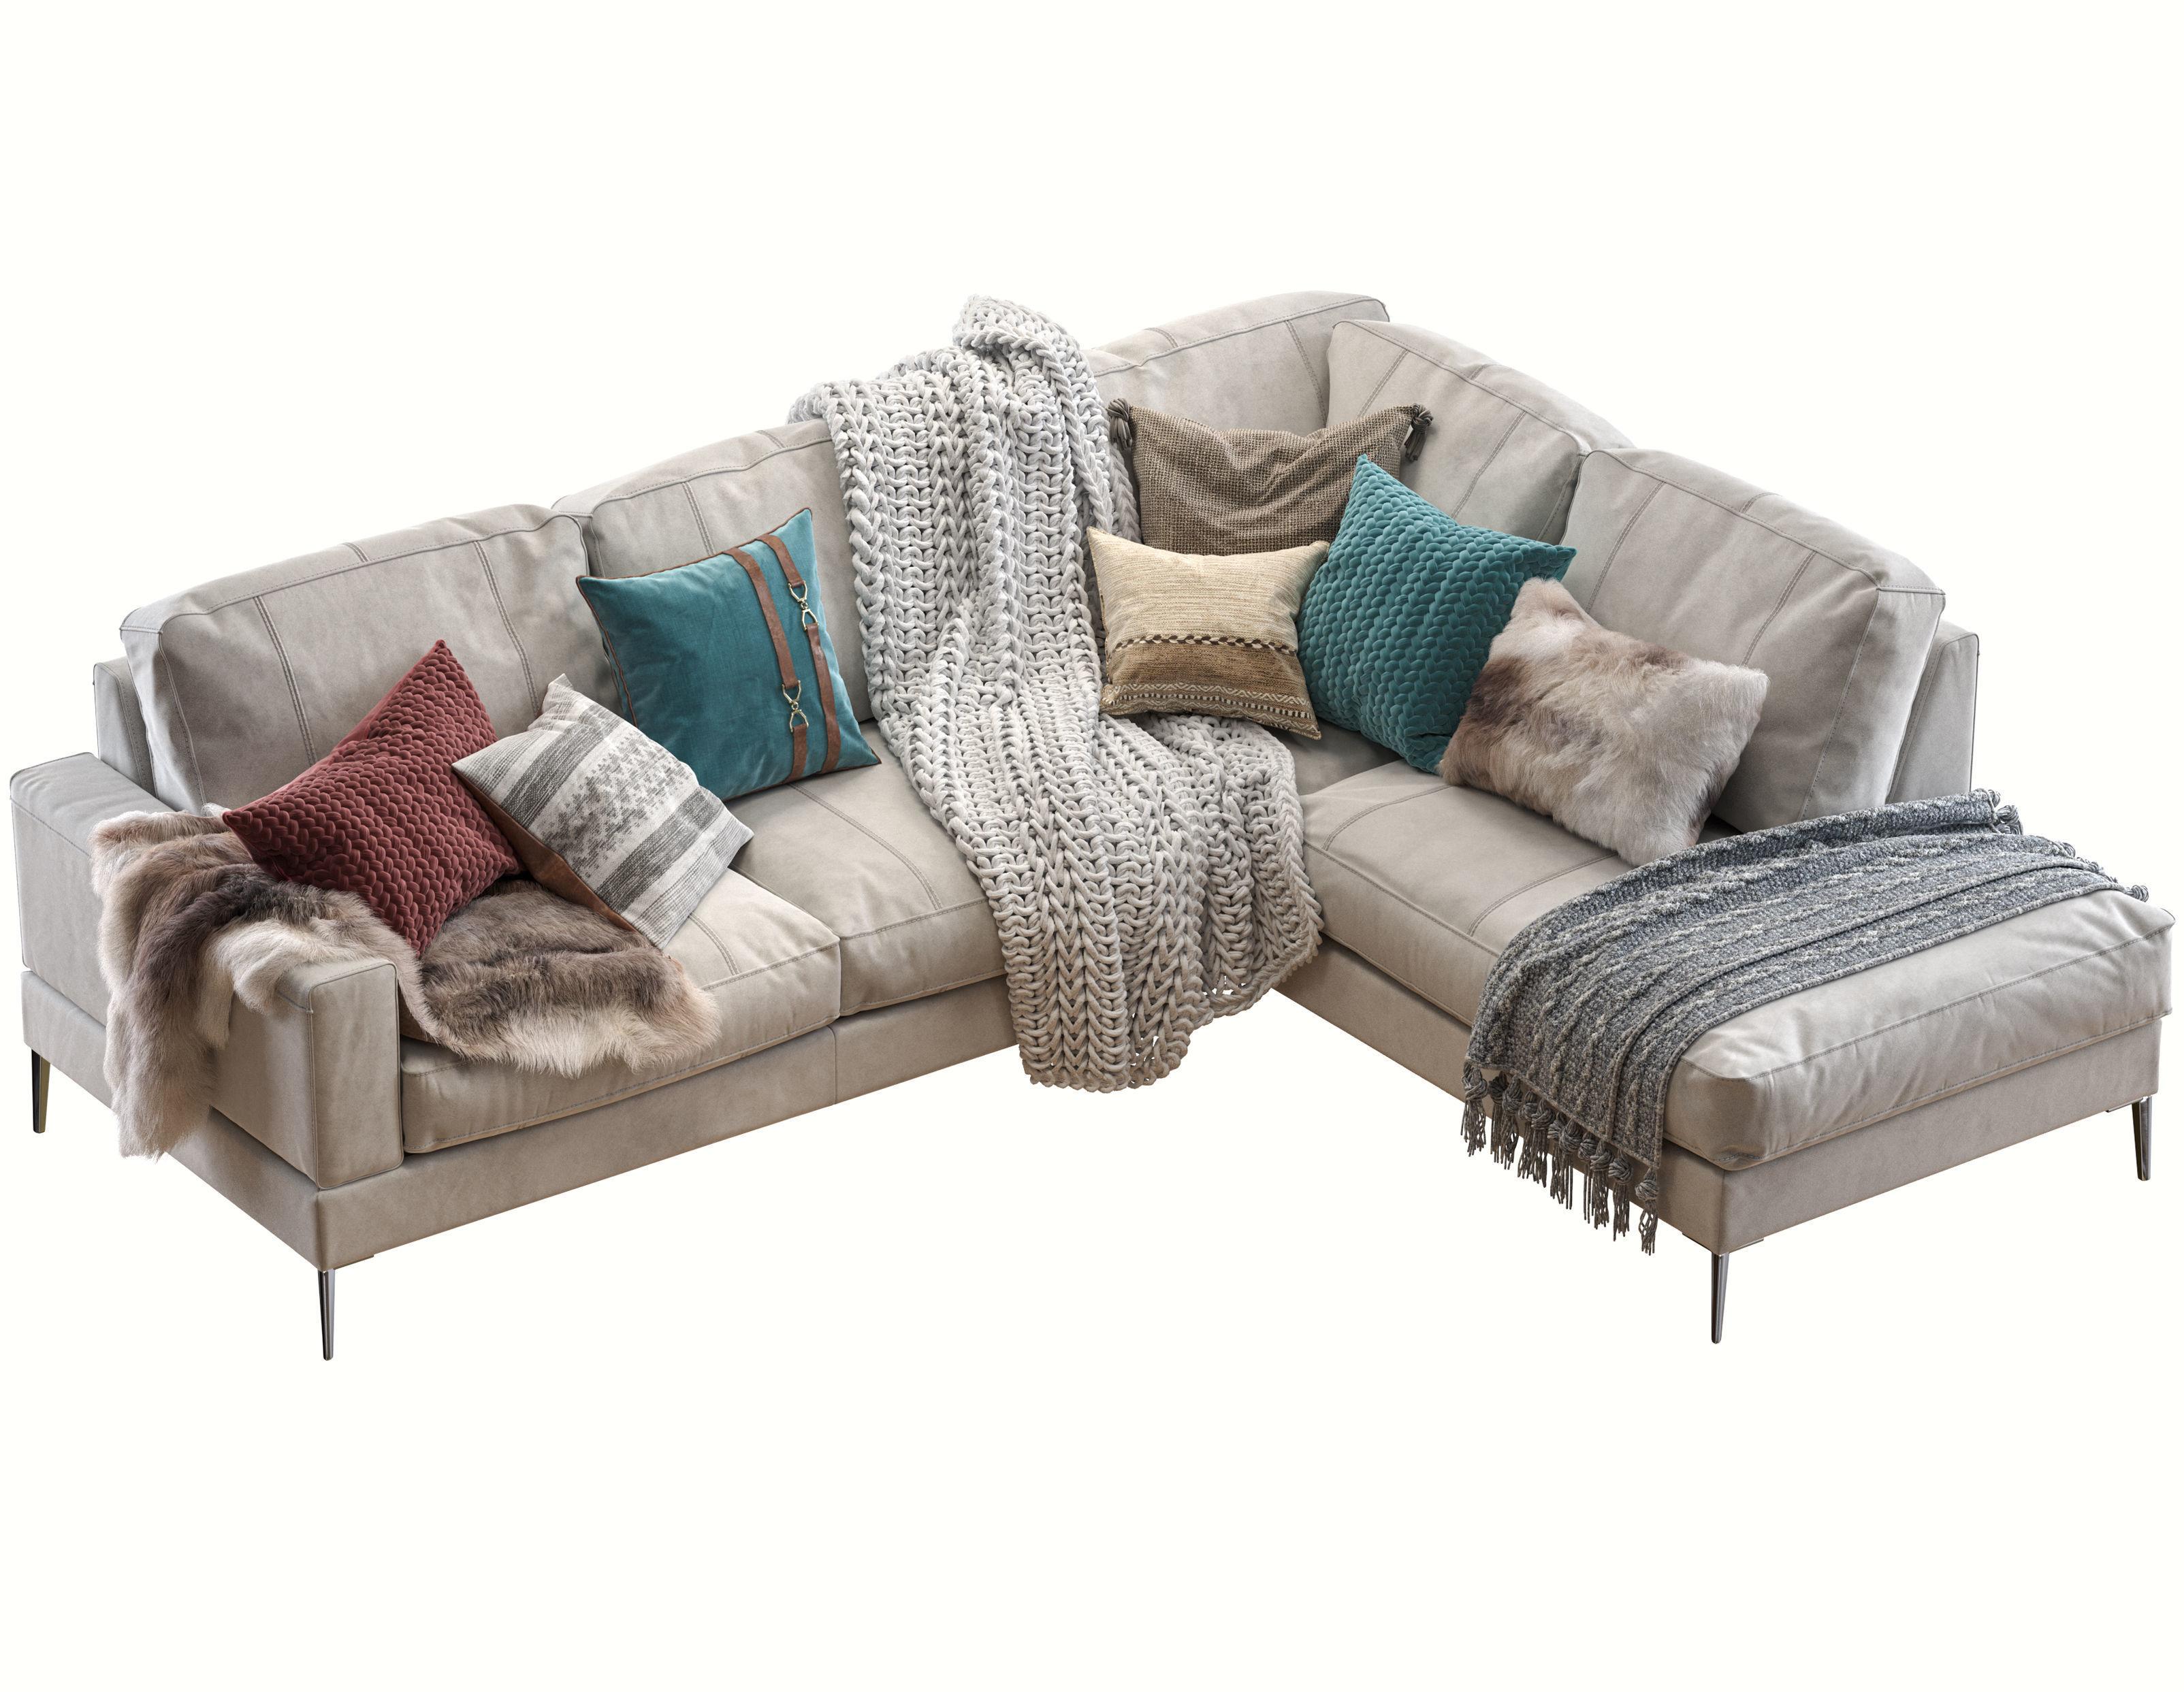 Capri sectional sofa